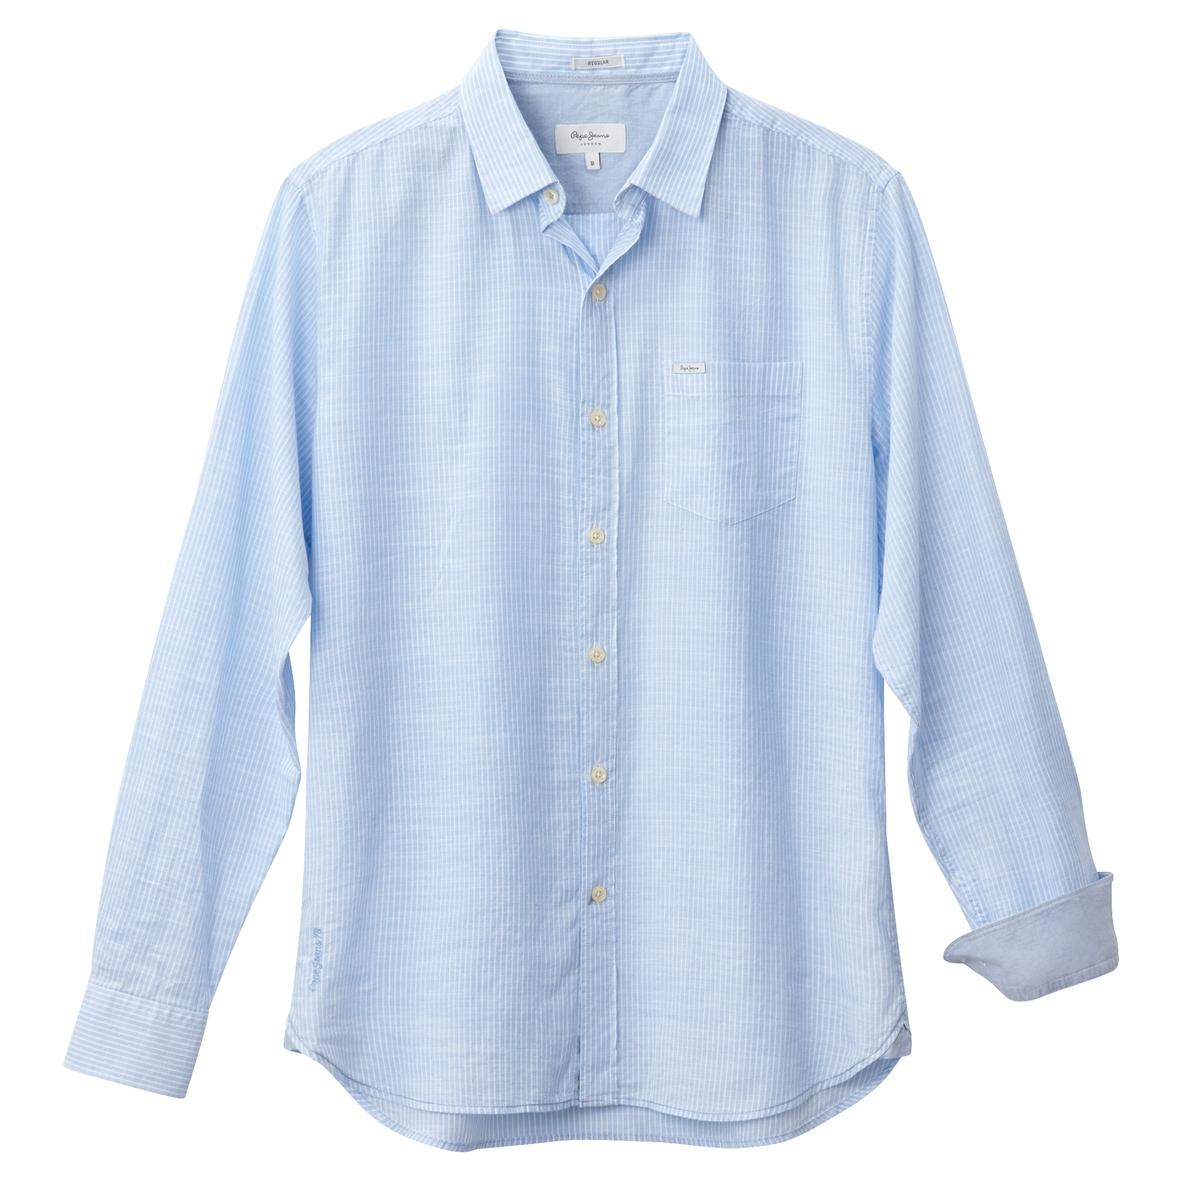 Camisa recta estampada de manga larga